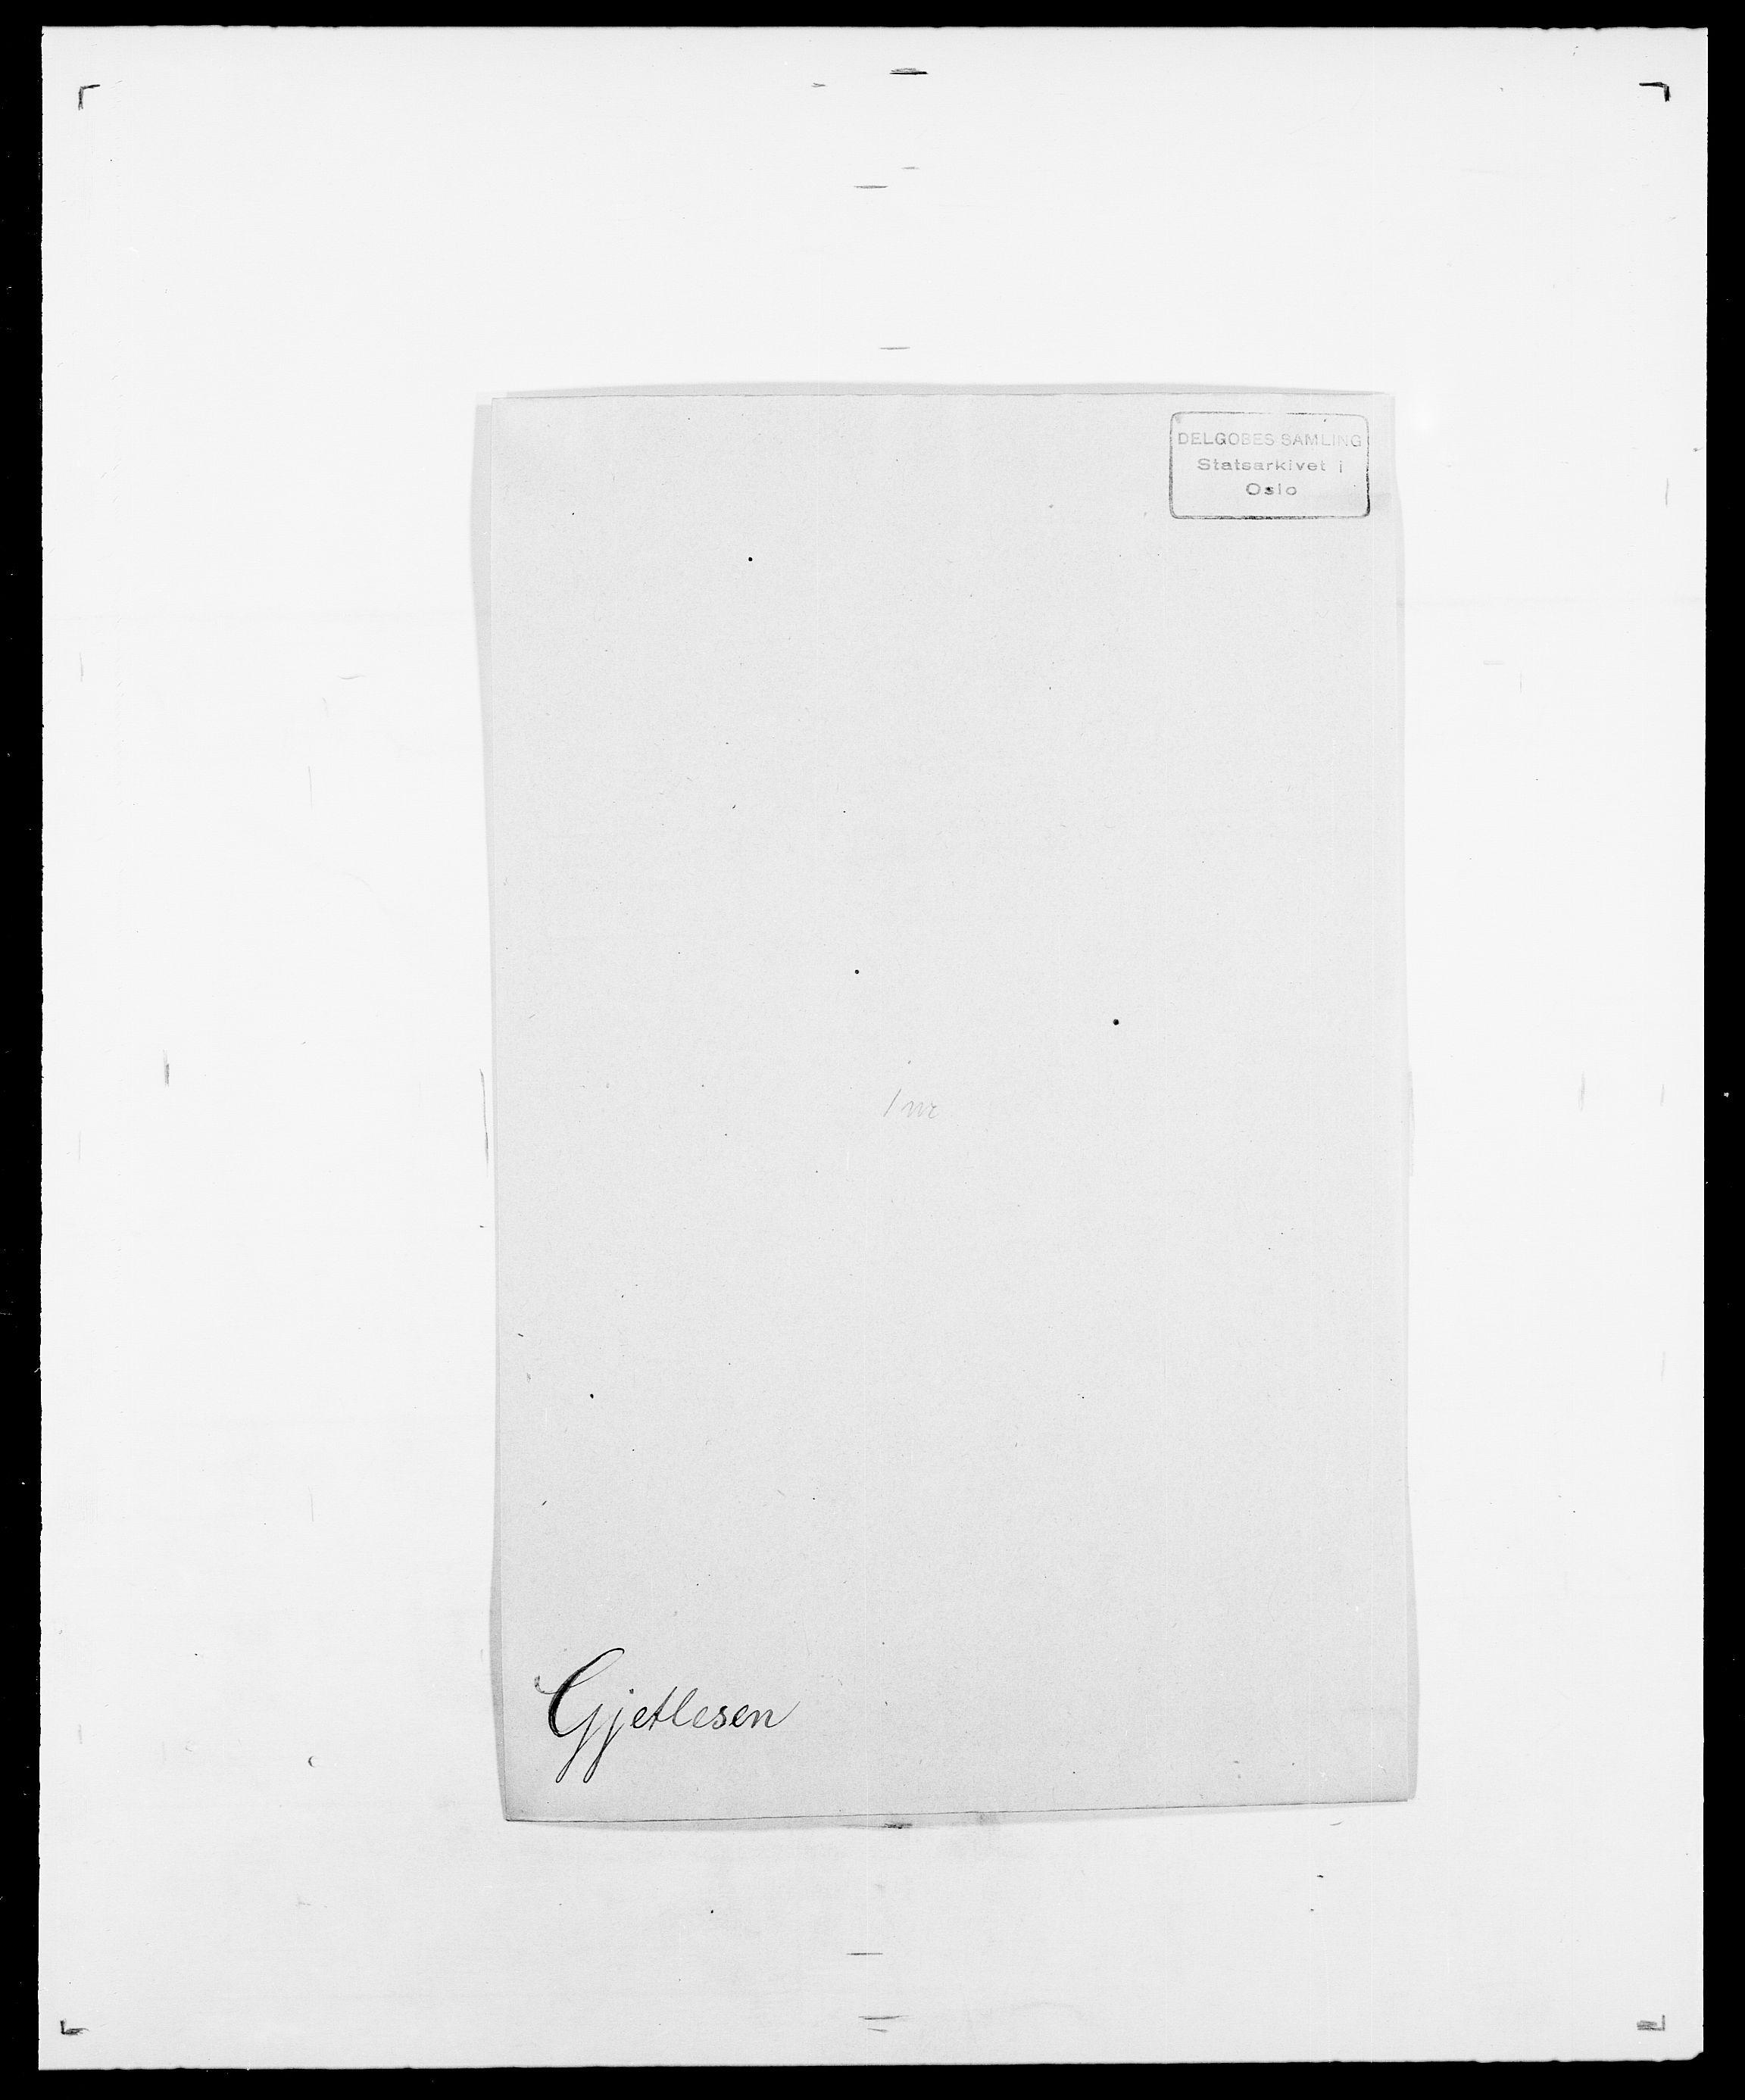 SAO, Delgobe, Charles Antoine - samling, D/Da/L0014: Giebdhausen - Grip, s. 202